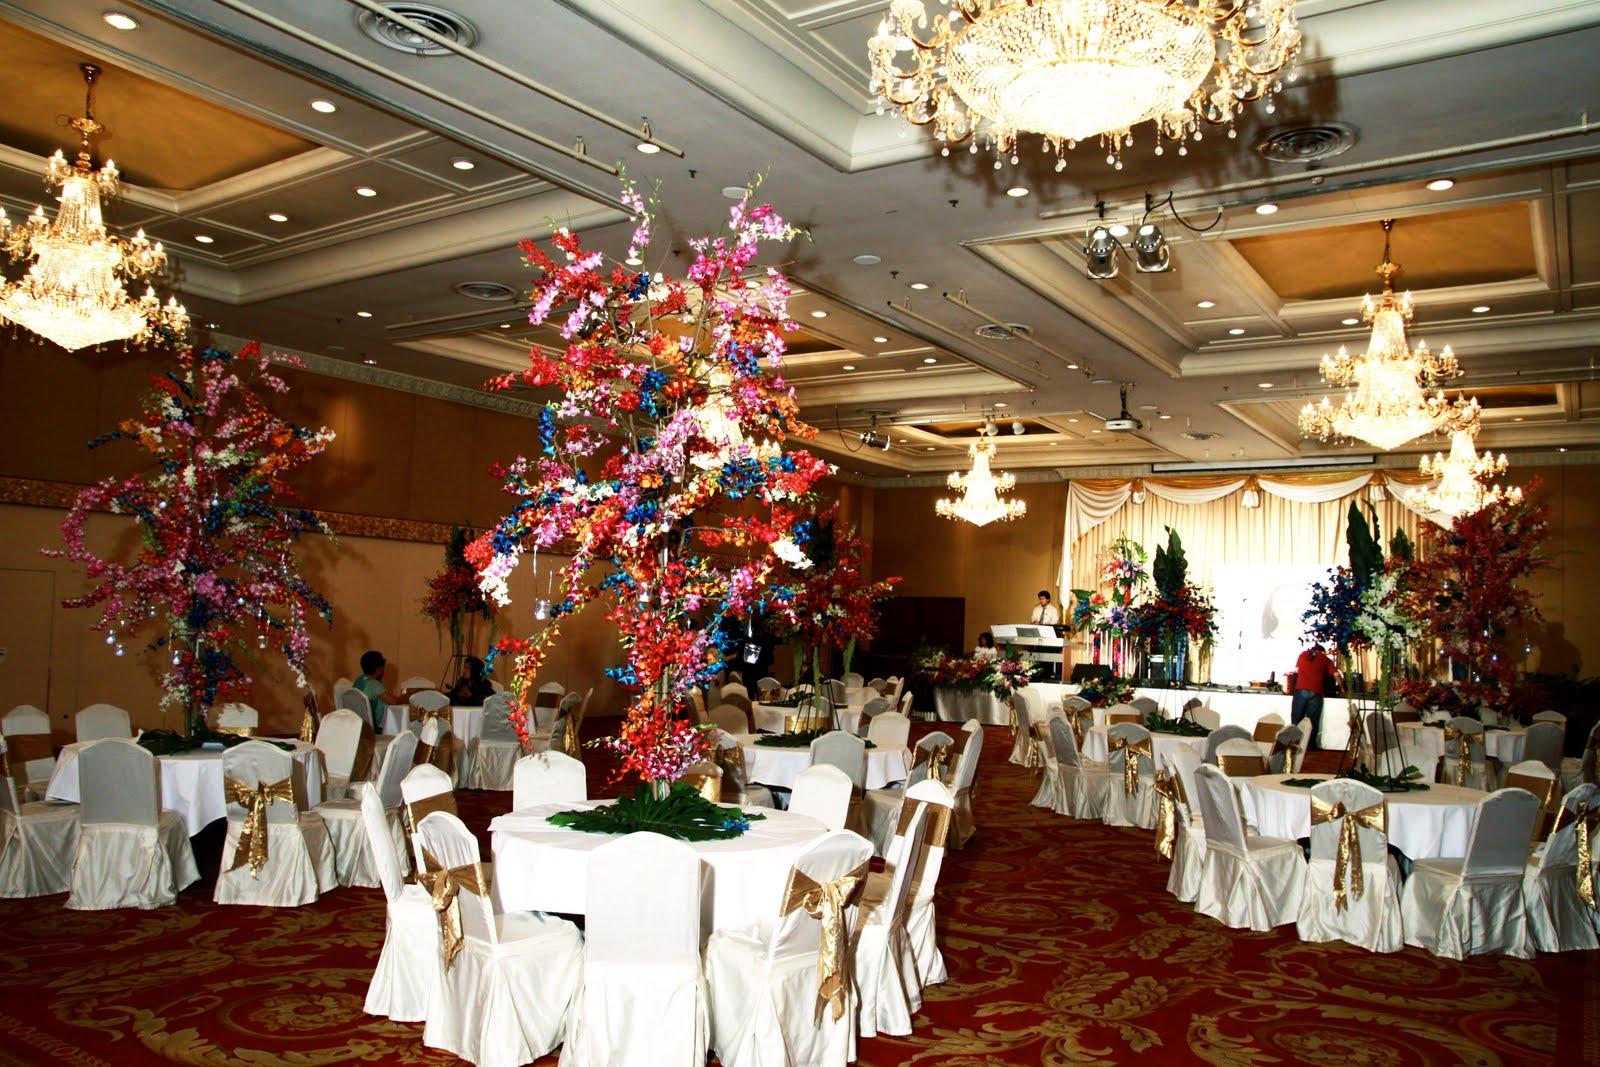 Thai wedding reception dinners